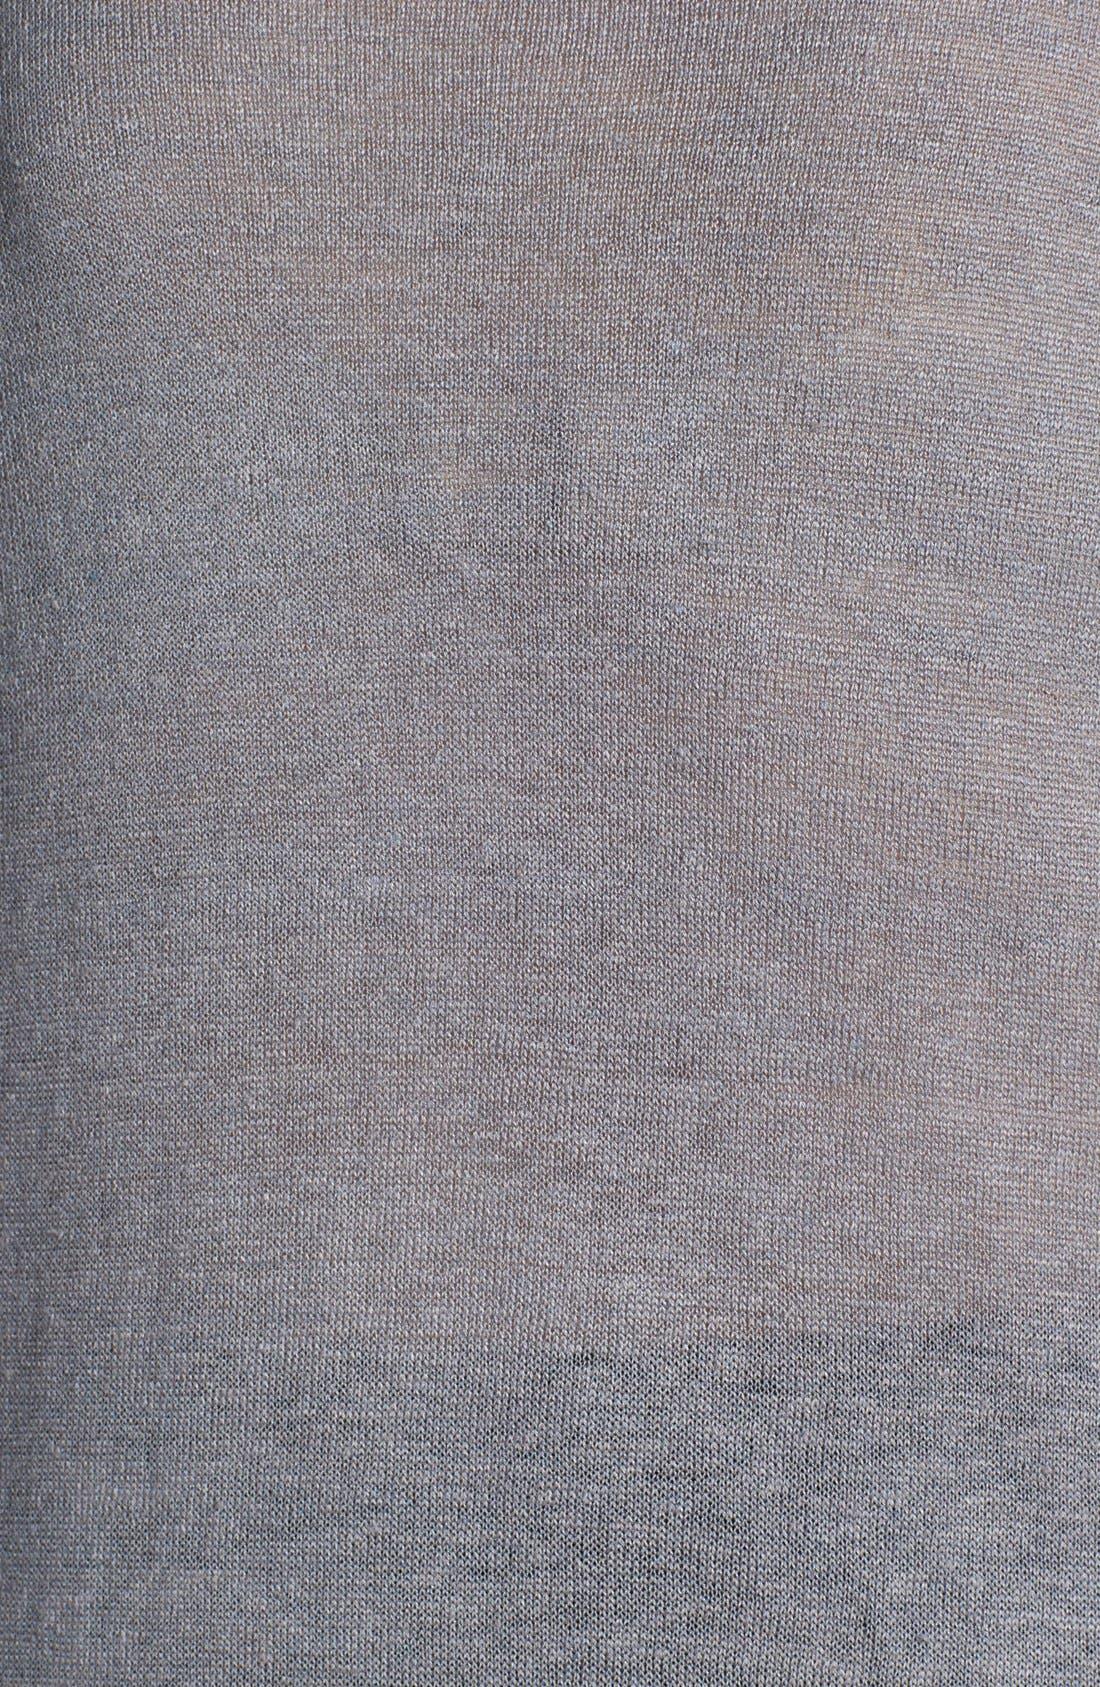 Alternate Image 3  - Eileen Fisher Linen & Silk Tunic Dress (Plus Size)